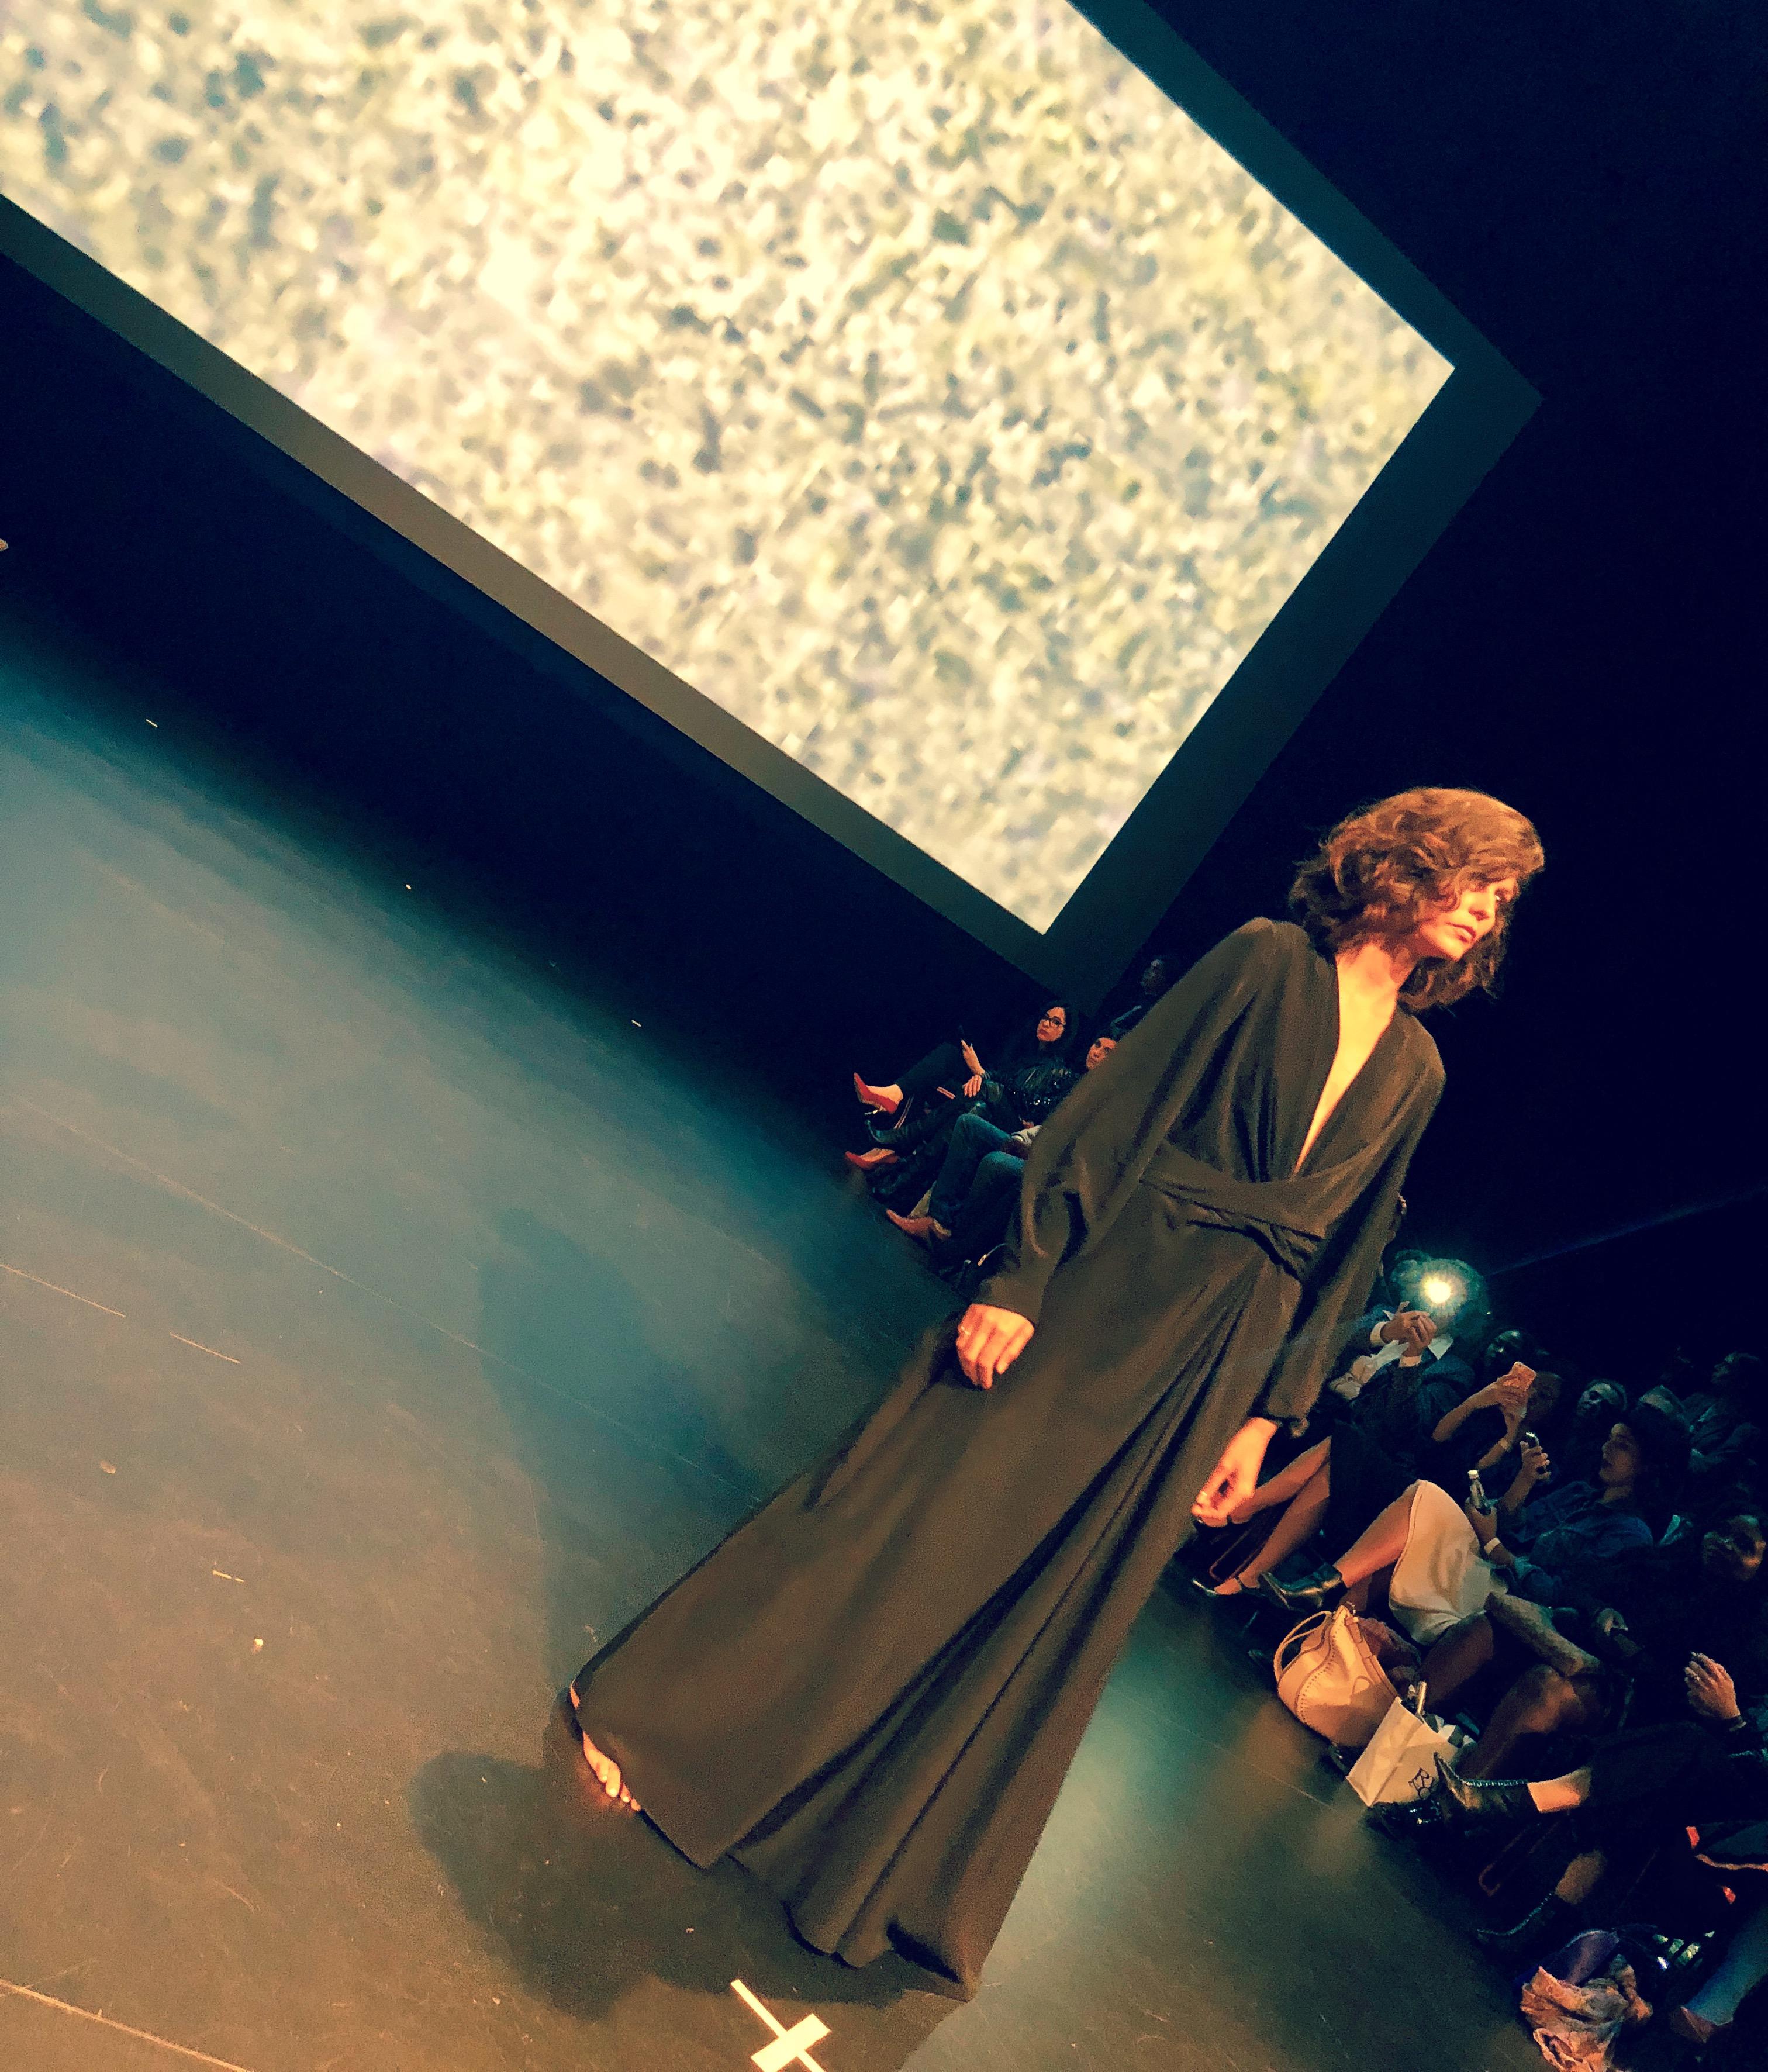 Fashion Preview 10: Markantoine, Leinad, Lucas Stowe ……